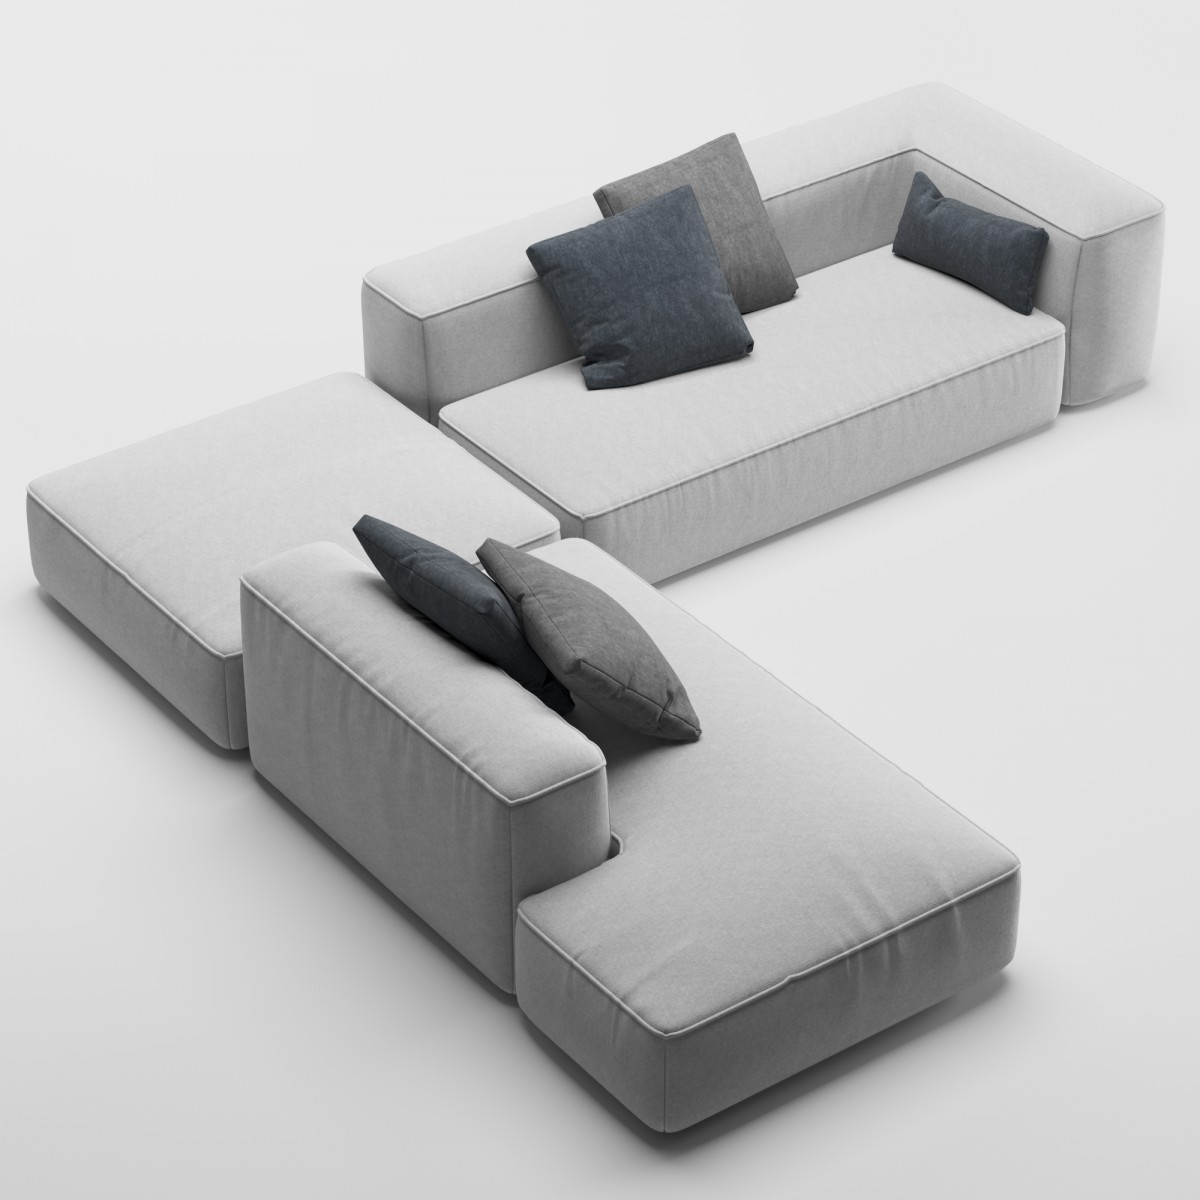 Lema Cloud Sofa Model For Vray Corona